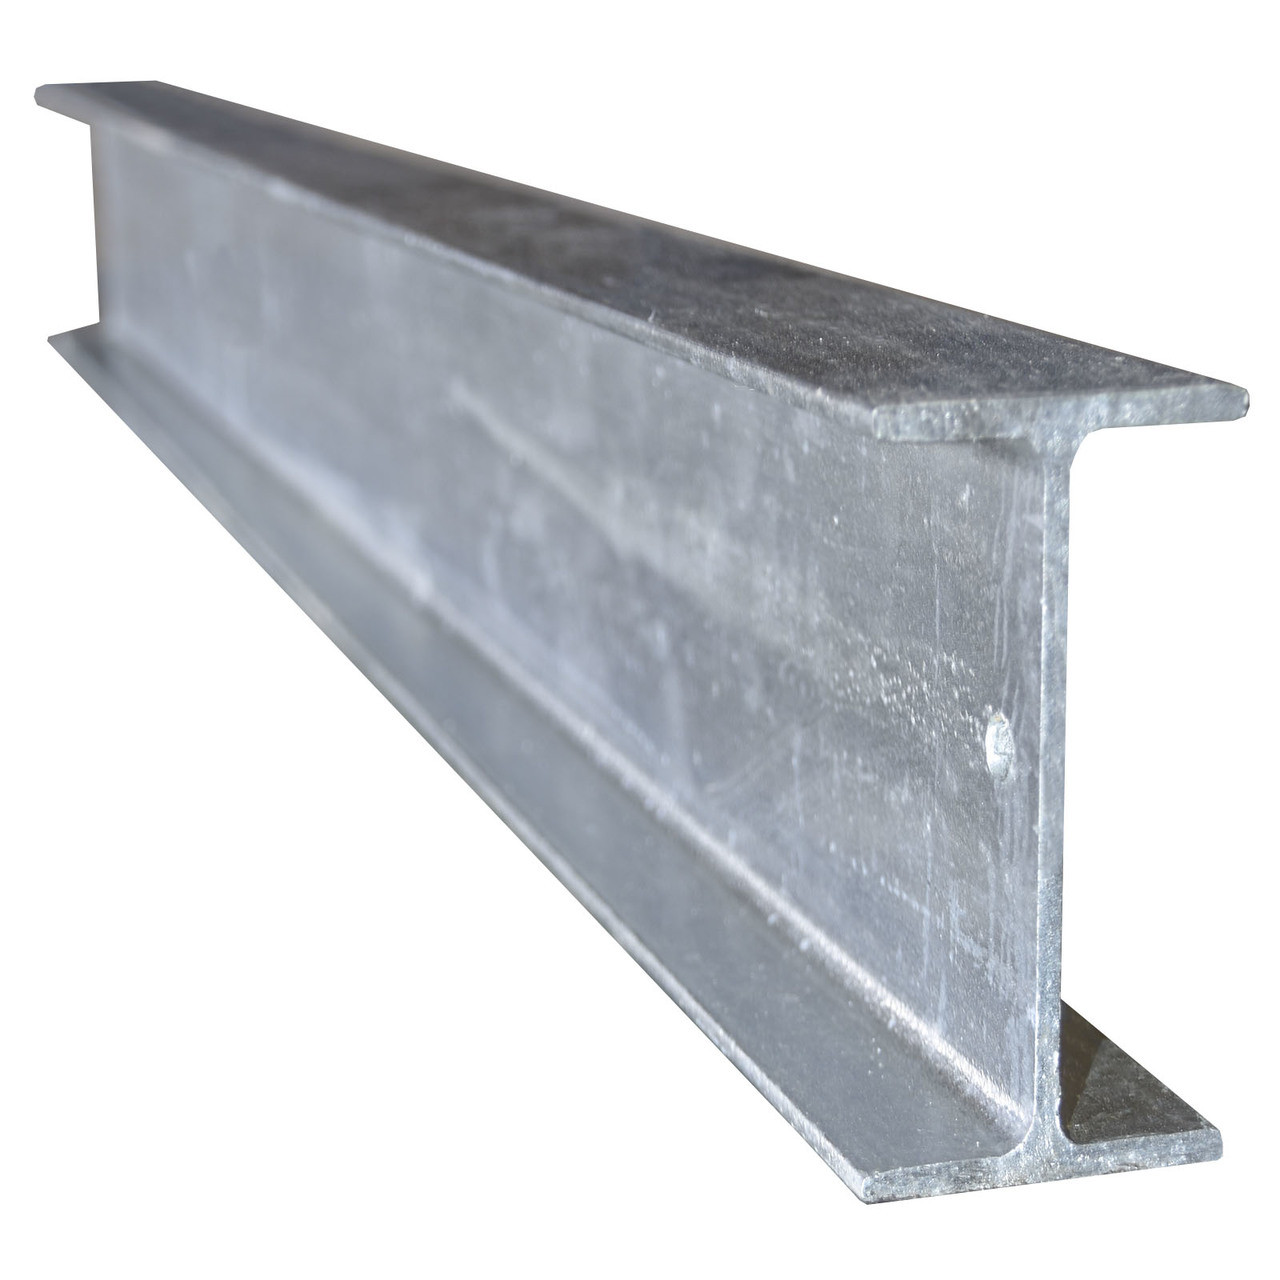 Hot Dipped Galvanised Steel I Beam 100 Uc 14 8 900mm